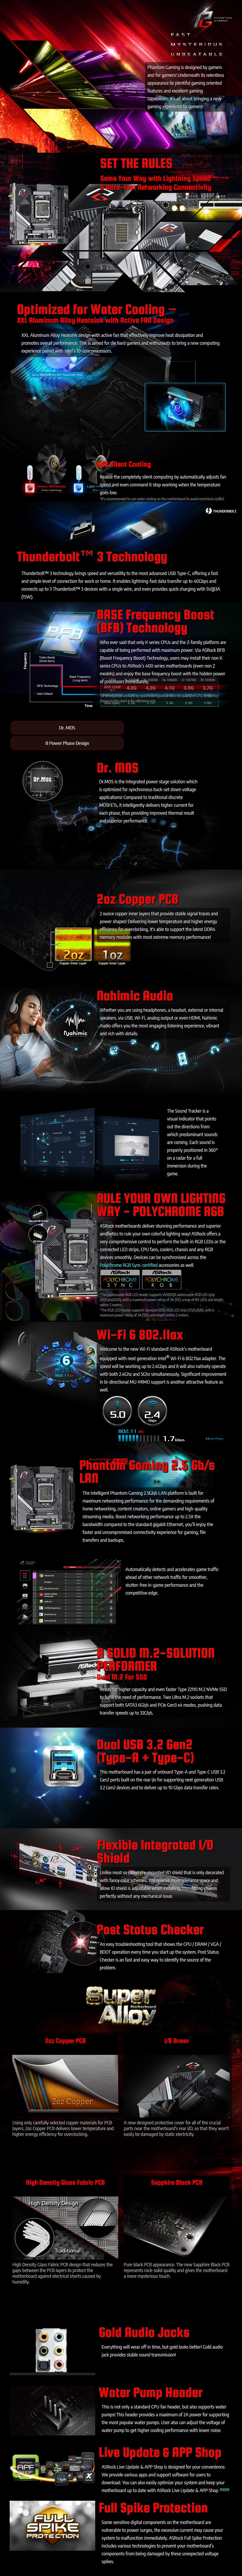 ASRock Z490 Phantom Gaming-ITX/TB3 LGA 1200 Mini-ITX Motherboard - Overview 1